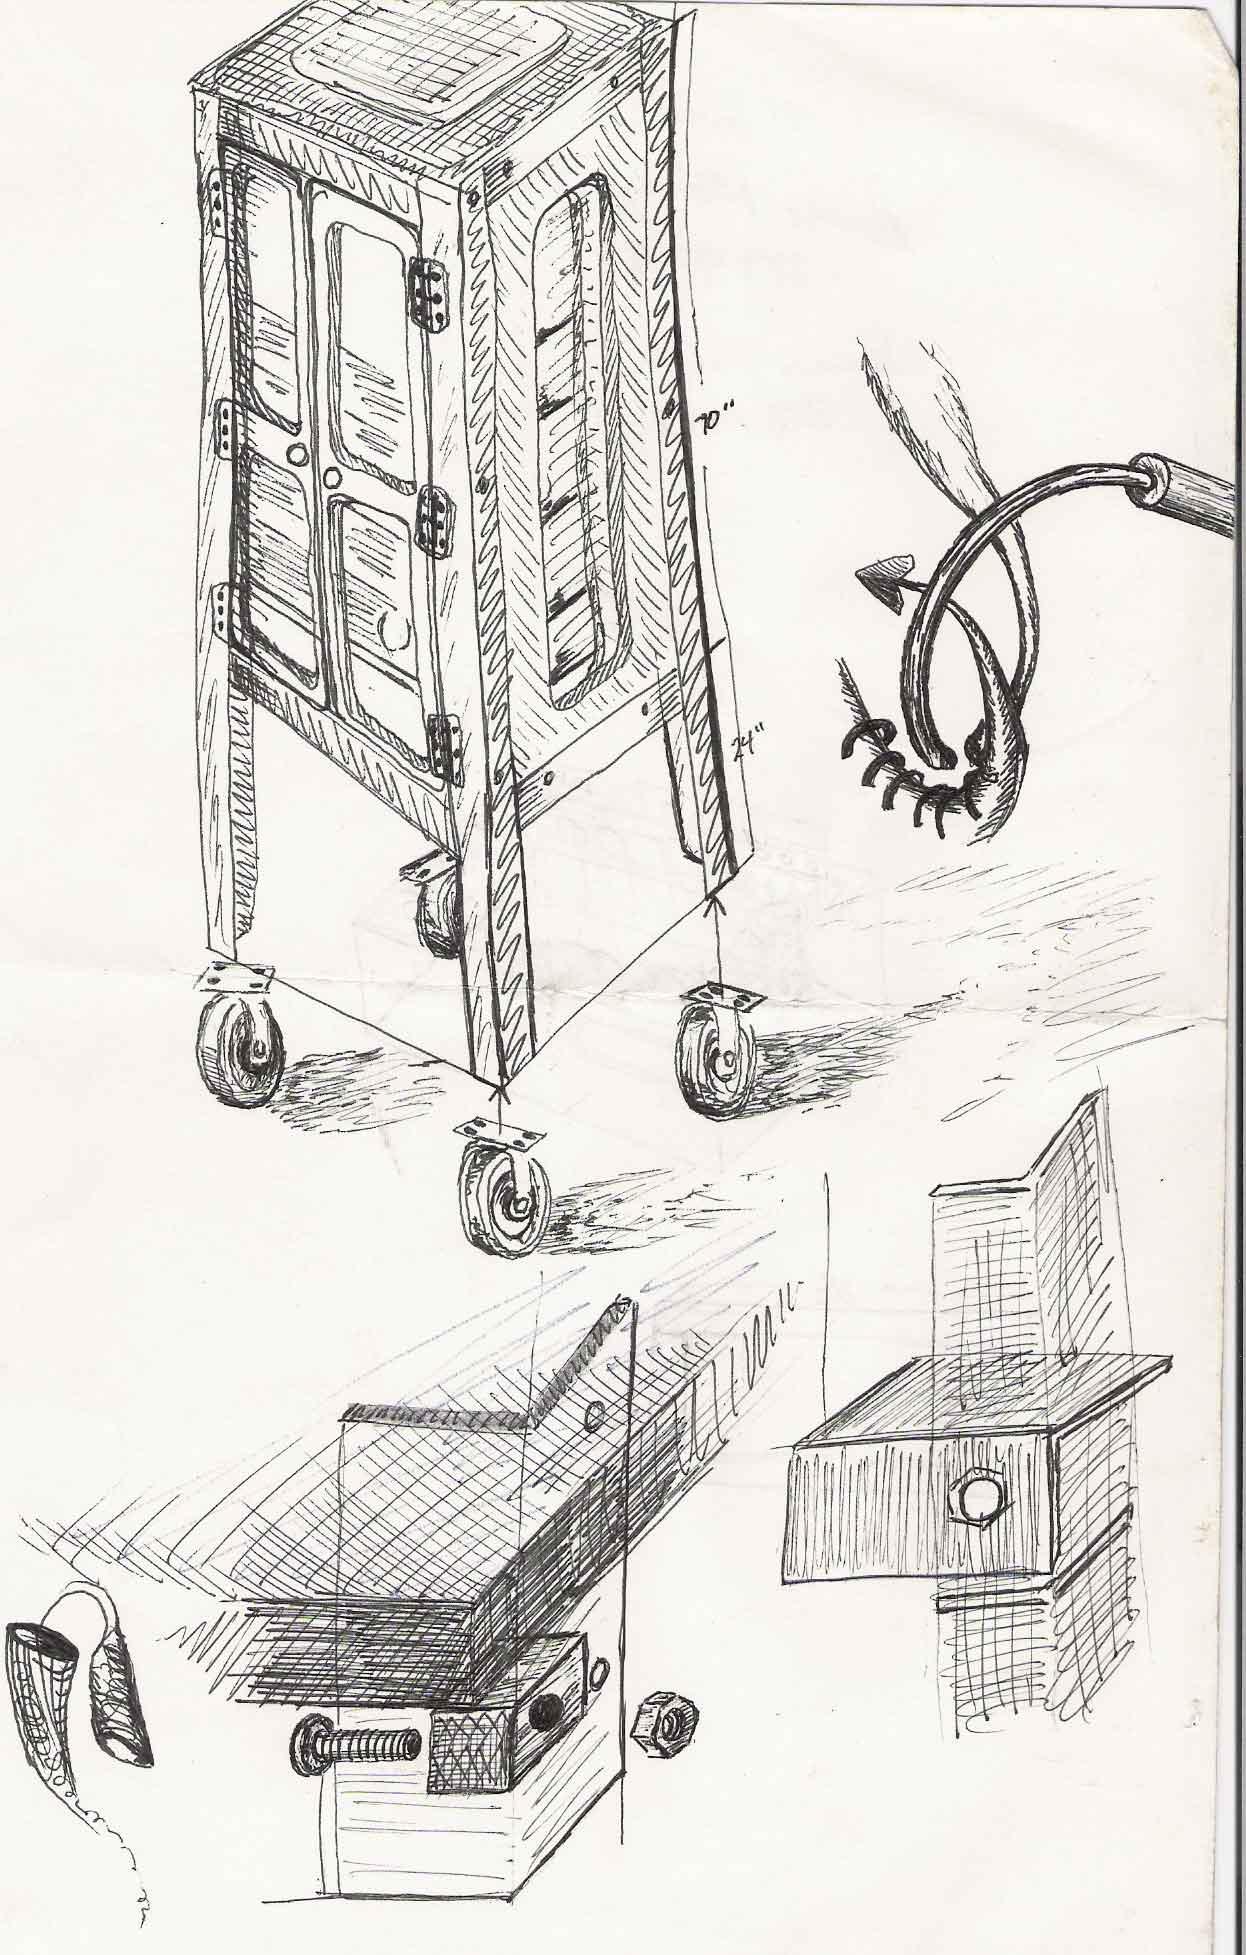 sketch-45-sept-05.jpg